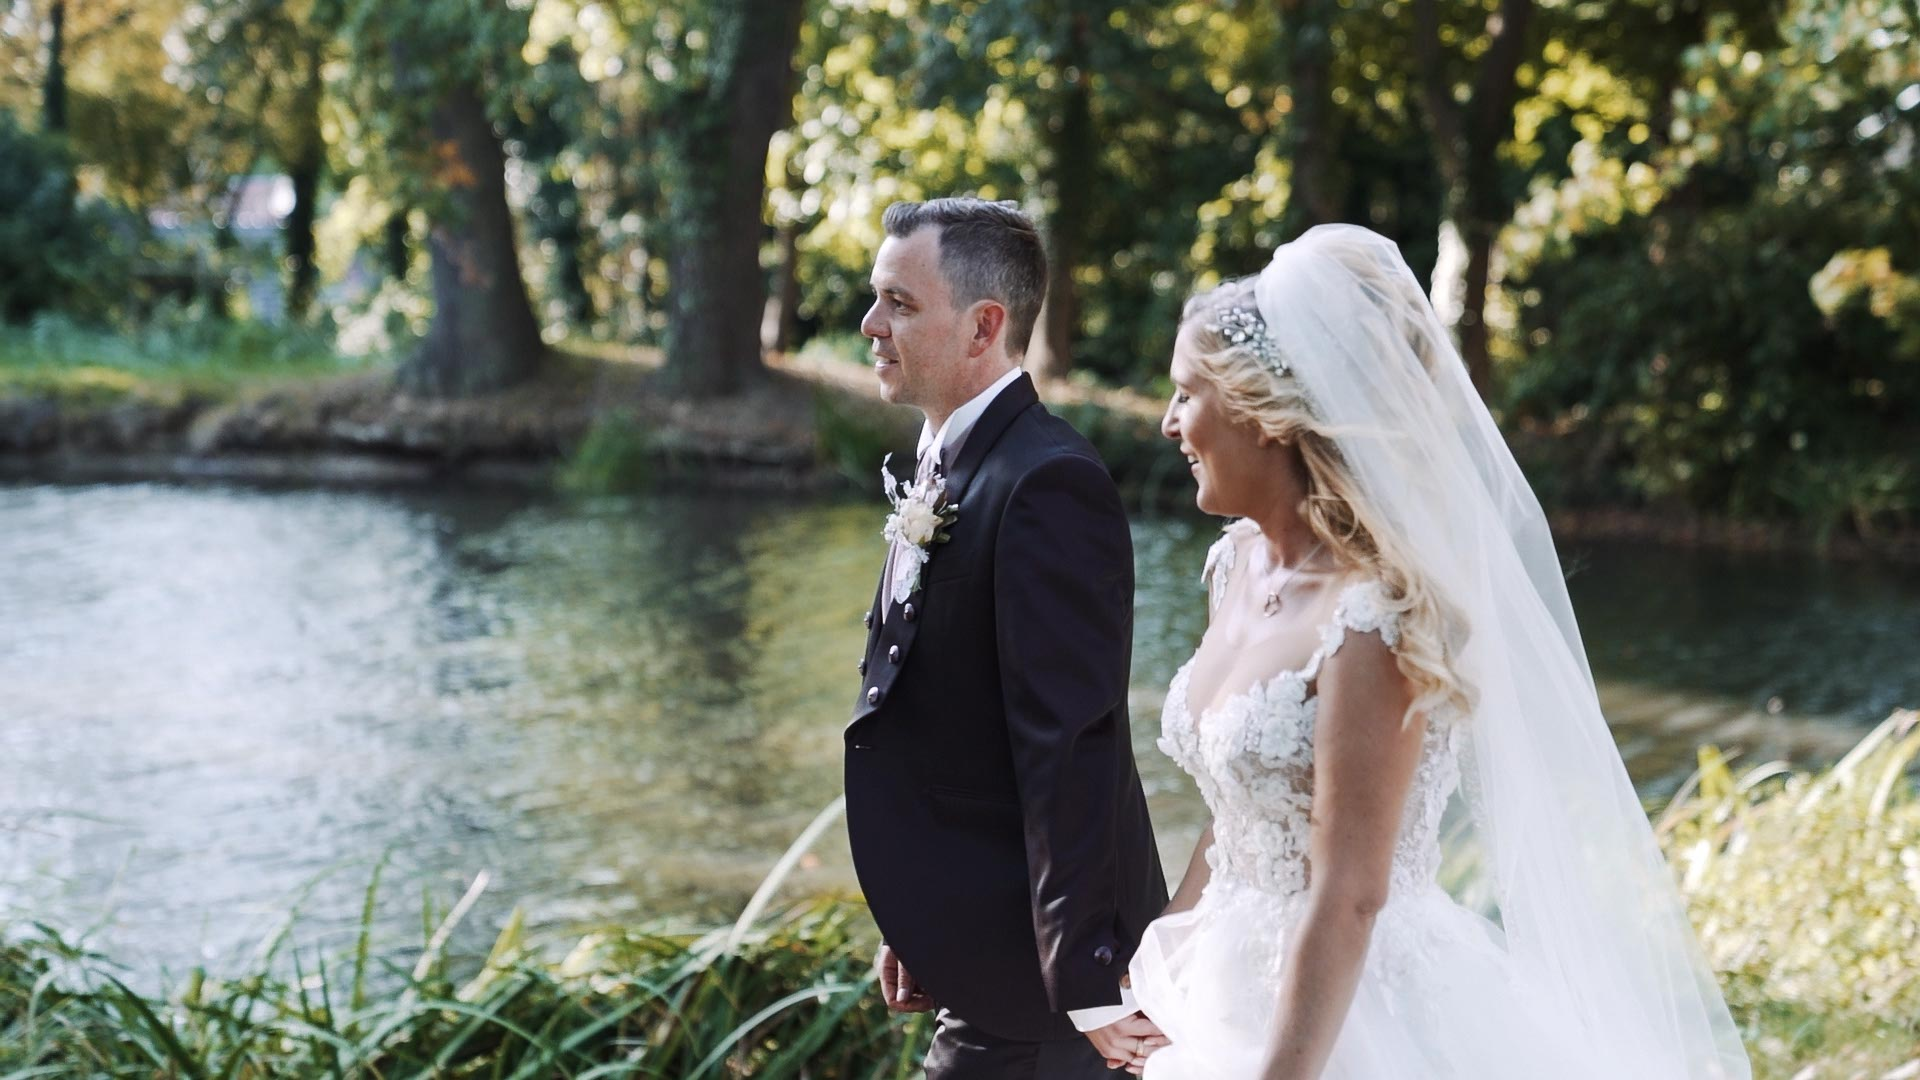 Pascal & Jenny Hochzeitsfilm Schloss Vettelhoven Videograf Hochzeit Filmemacher 016